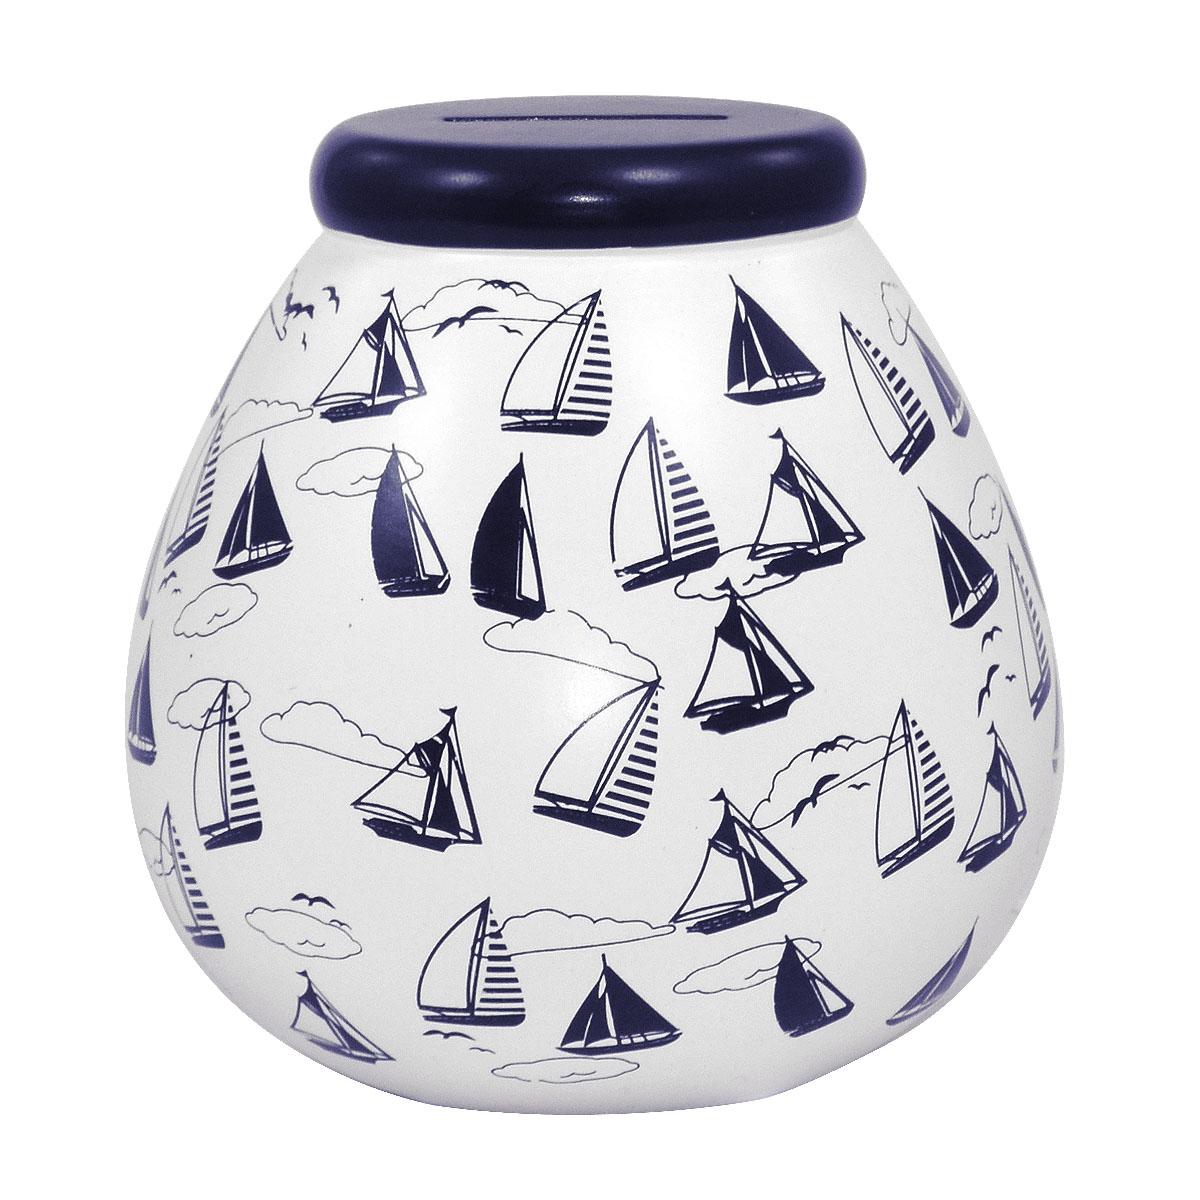 Nautical pots of dreams money pot gifts love kates - Nautical piggy banks ...